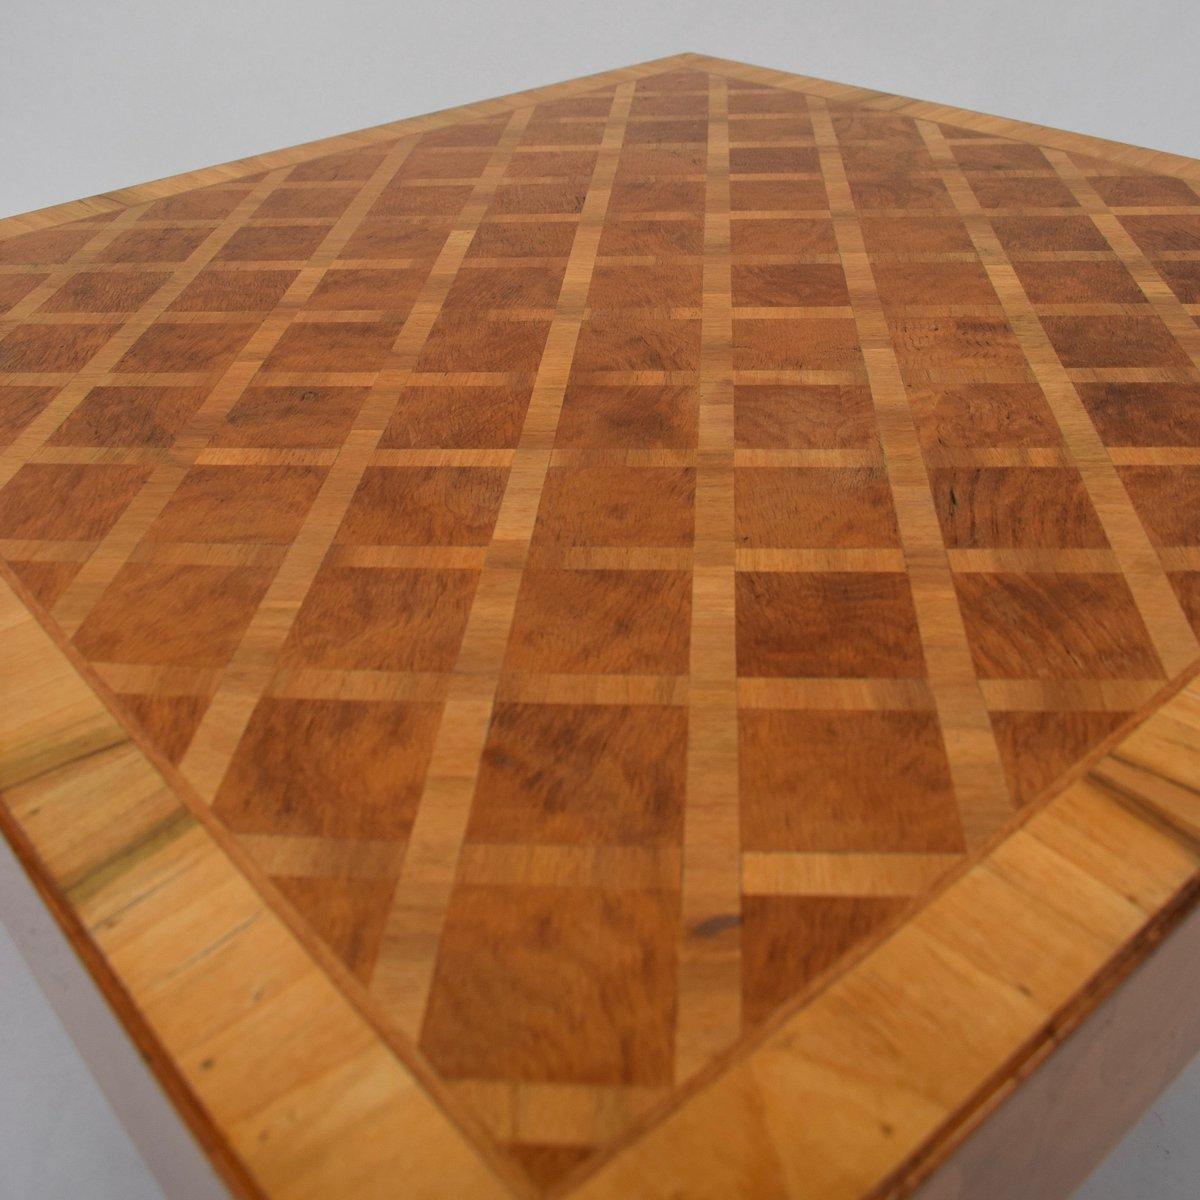 Burl Coffee Table Mid Century: Mid-Century Art Deco Burl Wood Coffee Table For Sale At Pamono